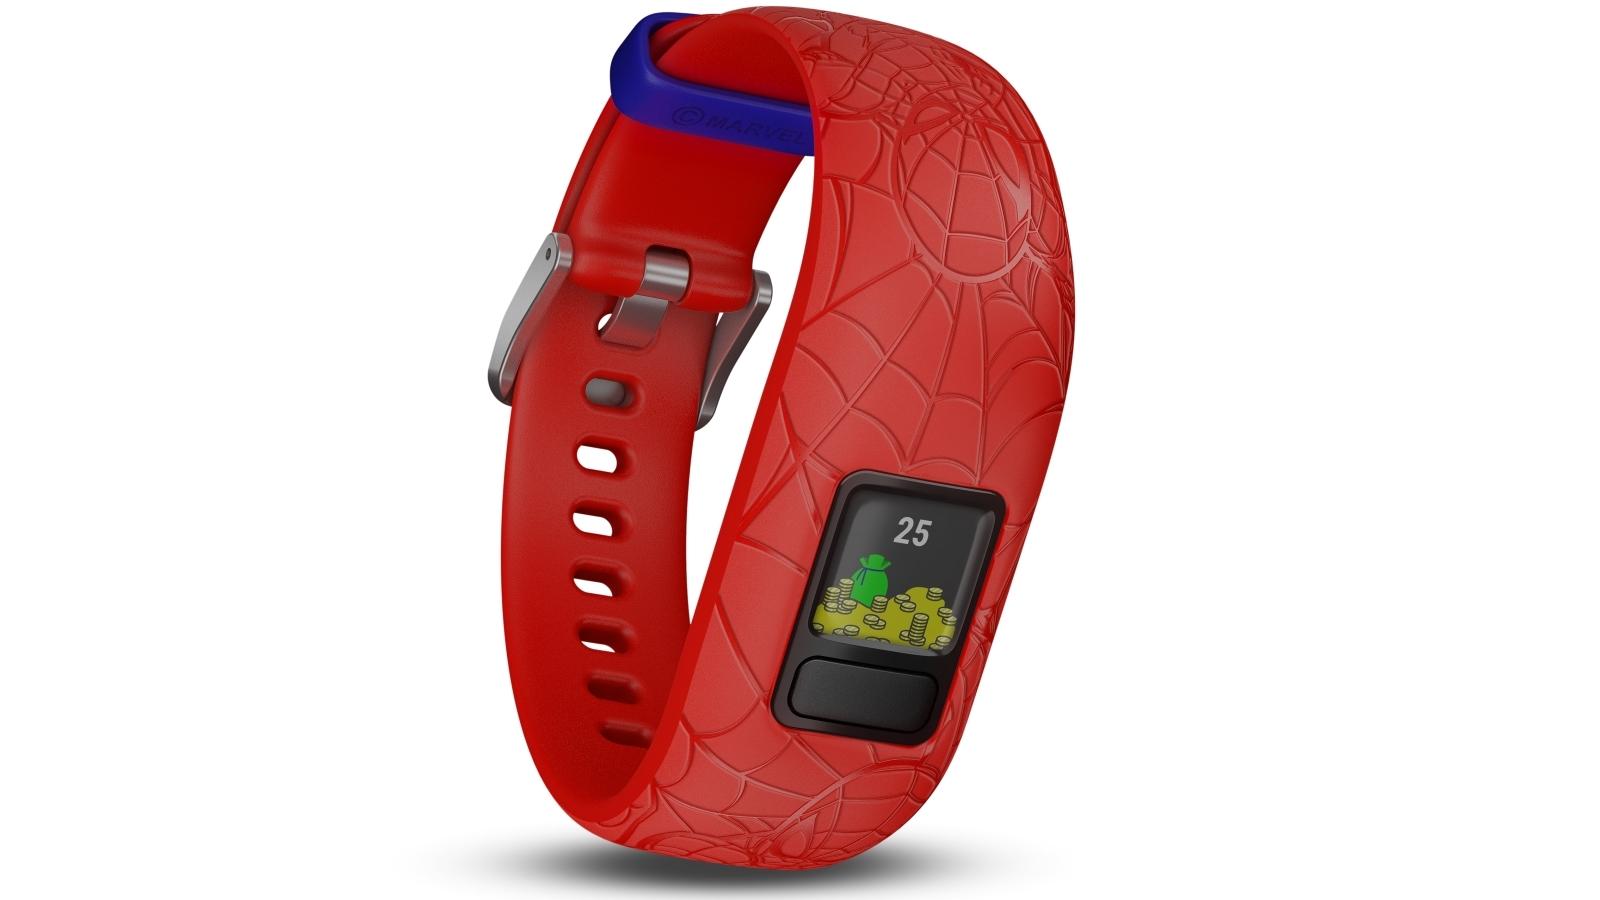 91c277a1 Cheap Garmin Marvel Spider-Man Vivofit Jr 2 Adjustable Activity Tracker -  Red | Harvey Norman AU